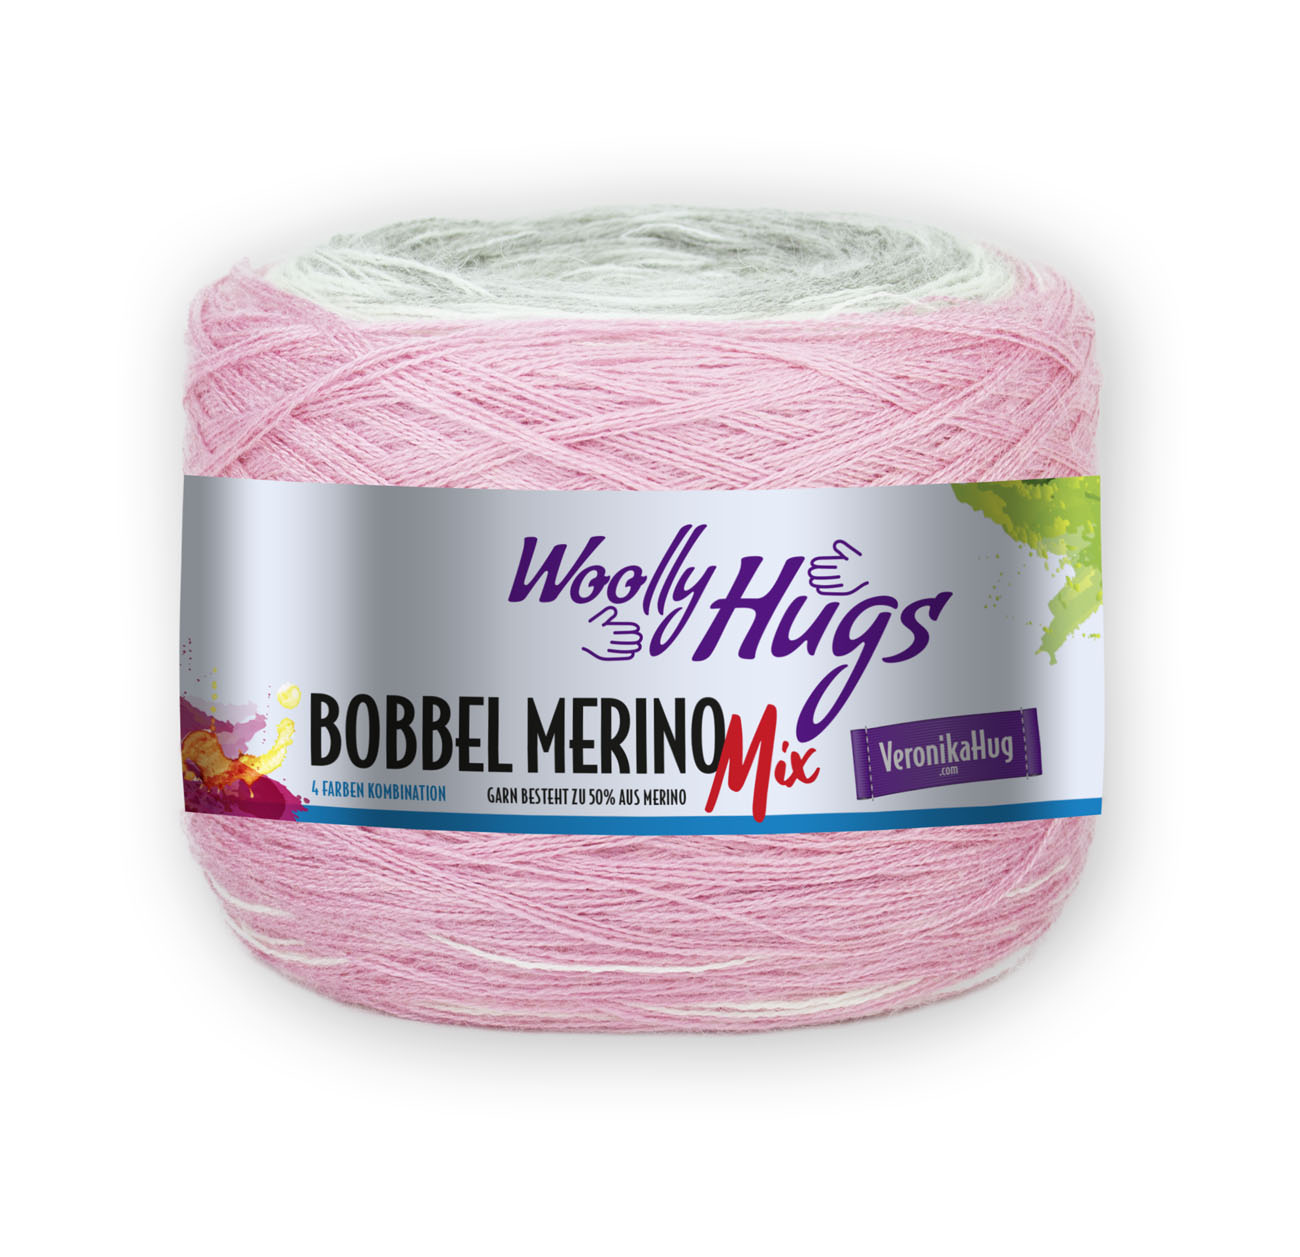 Woolly Hugs Bobbel Merinomix 706